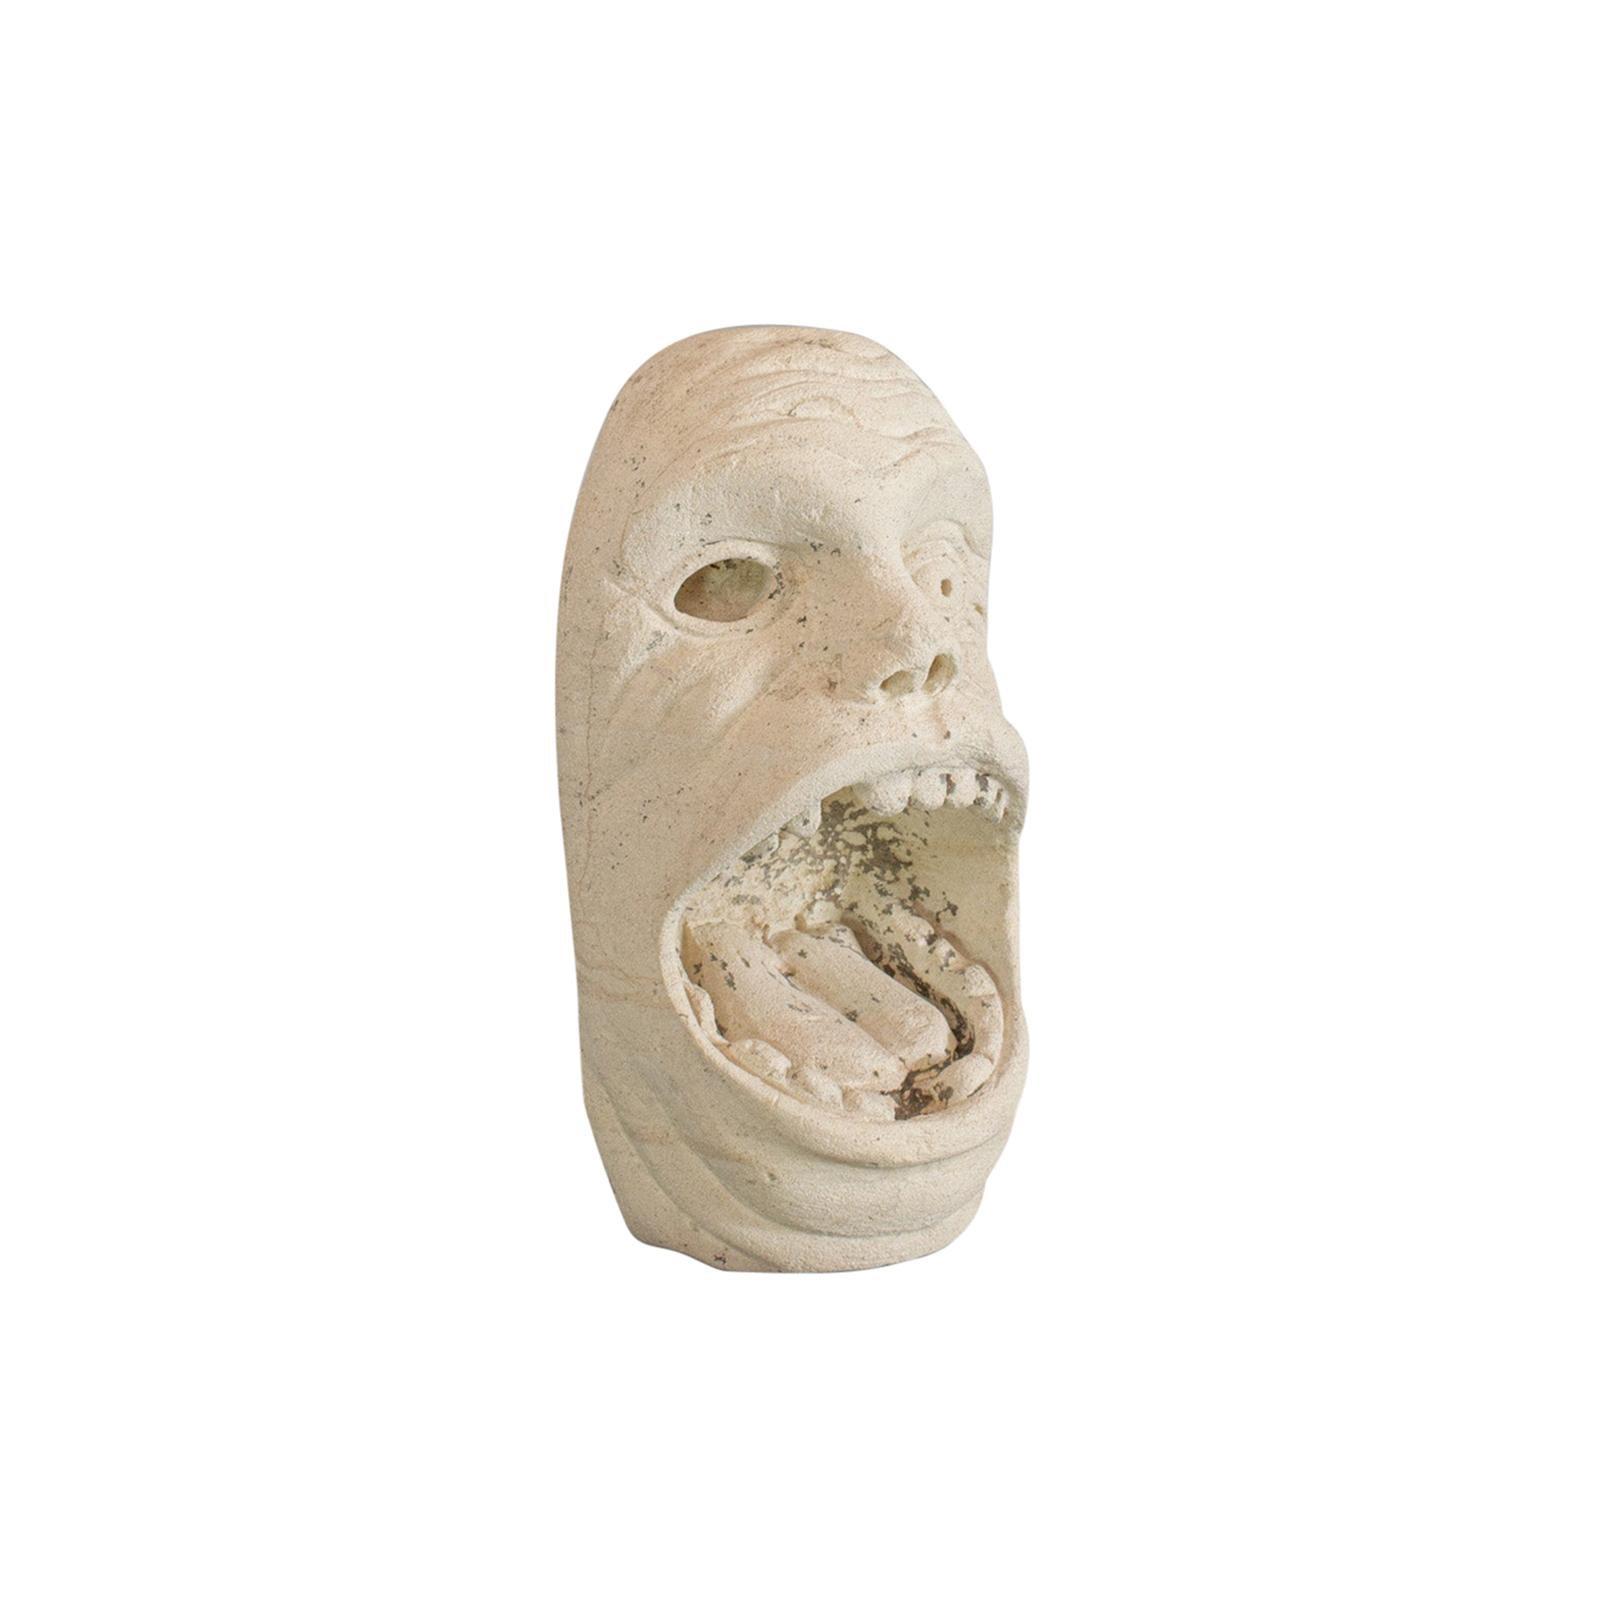 'Mind The Gap' Sculpture, Artwork, English, Bath Stone, Bust, Dominic Hurley